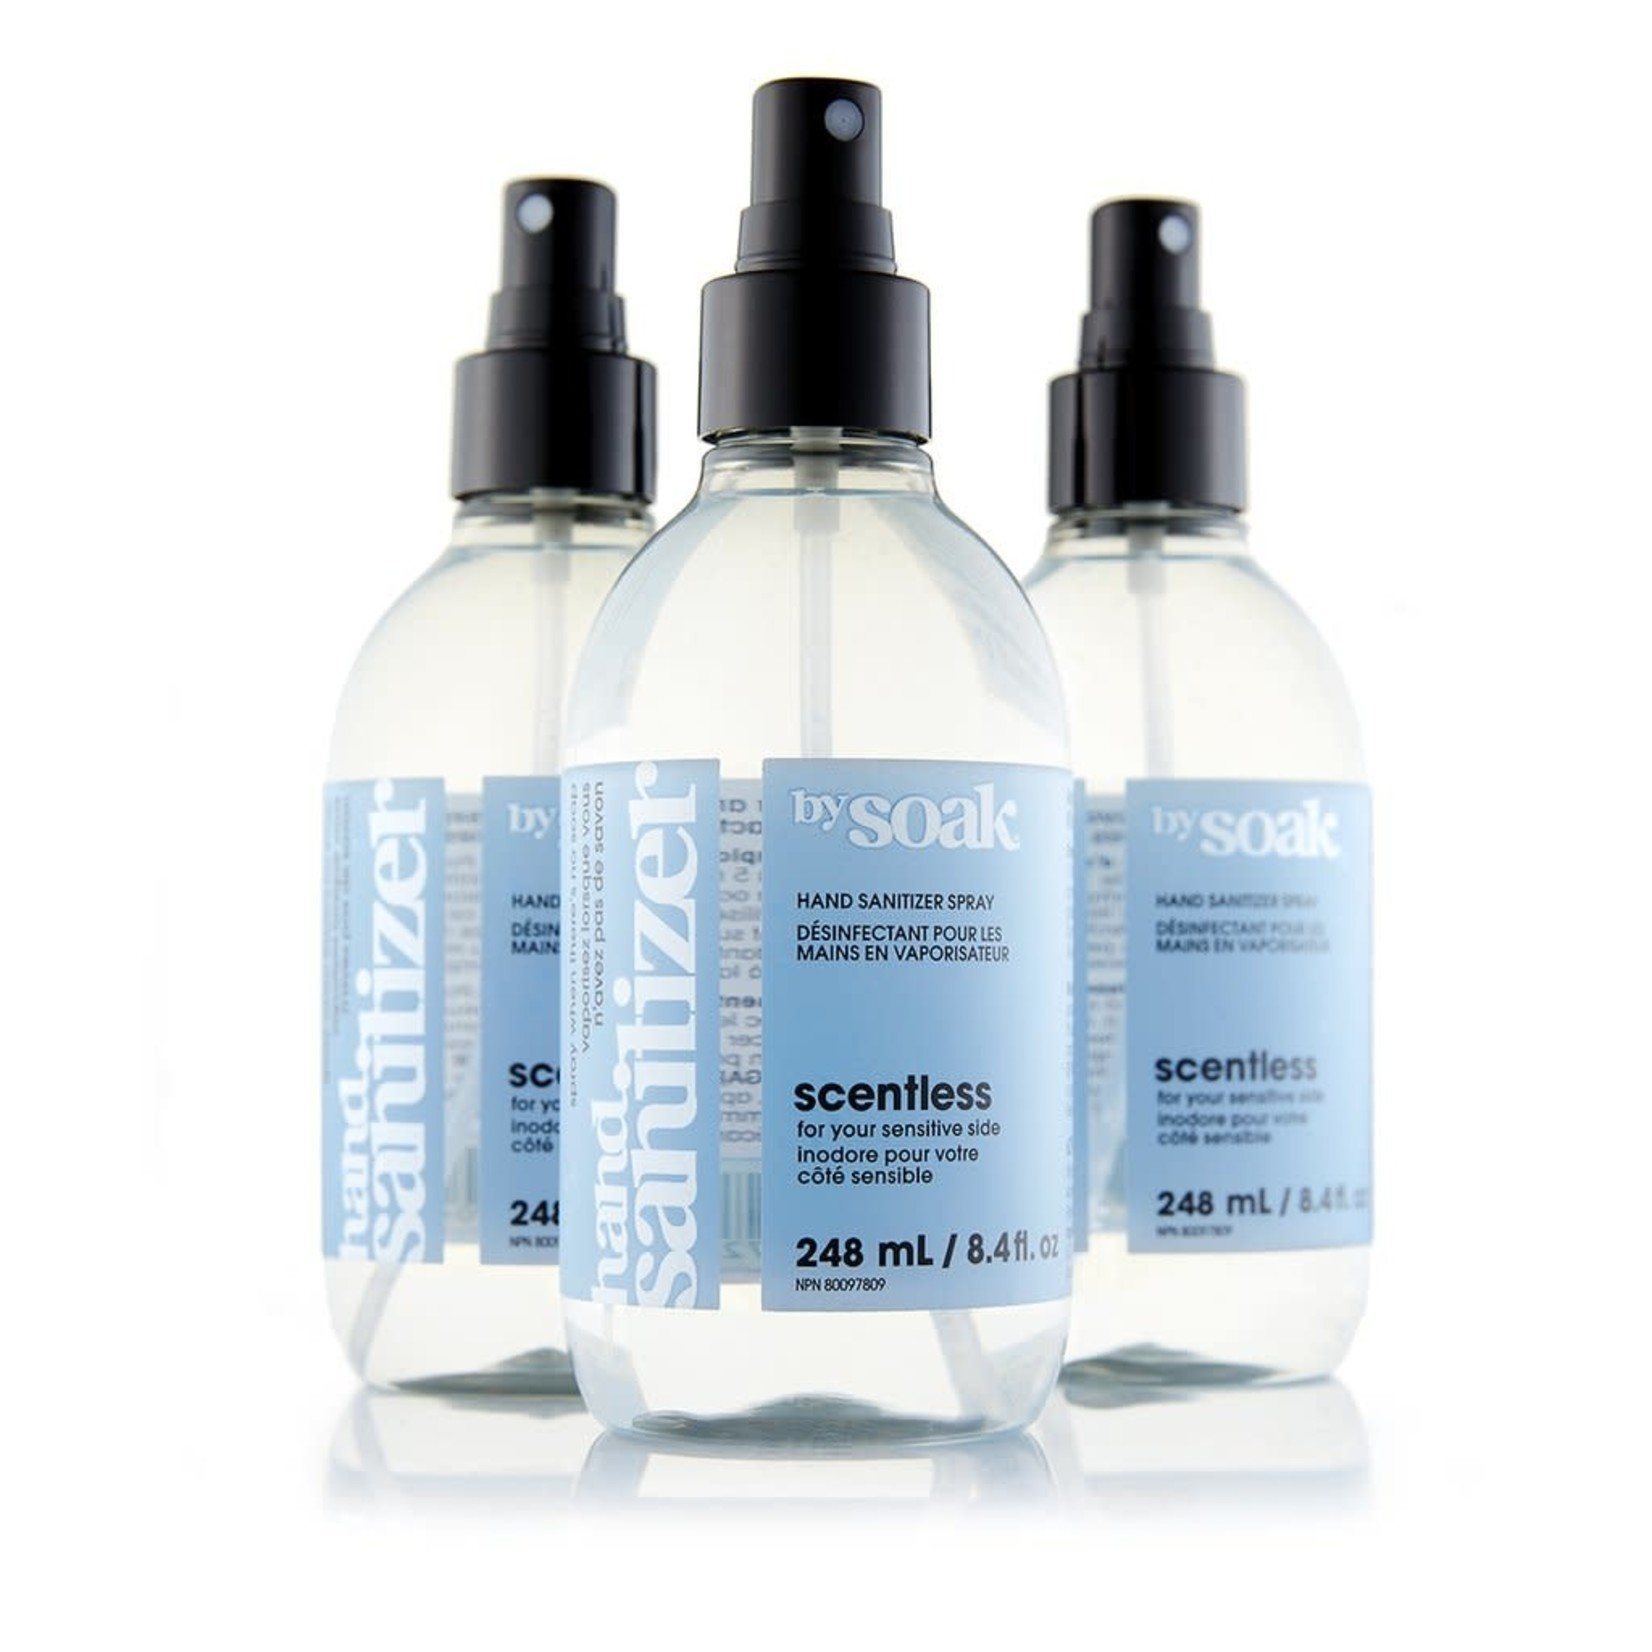 SOAK WASH Hand Sanitizer by Soak 8oz 248 ml x 3 Bottles